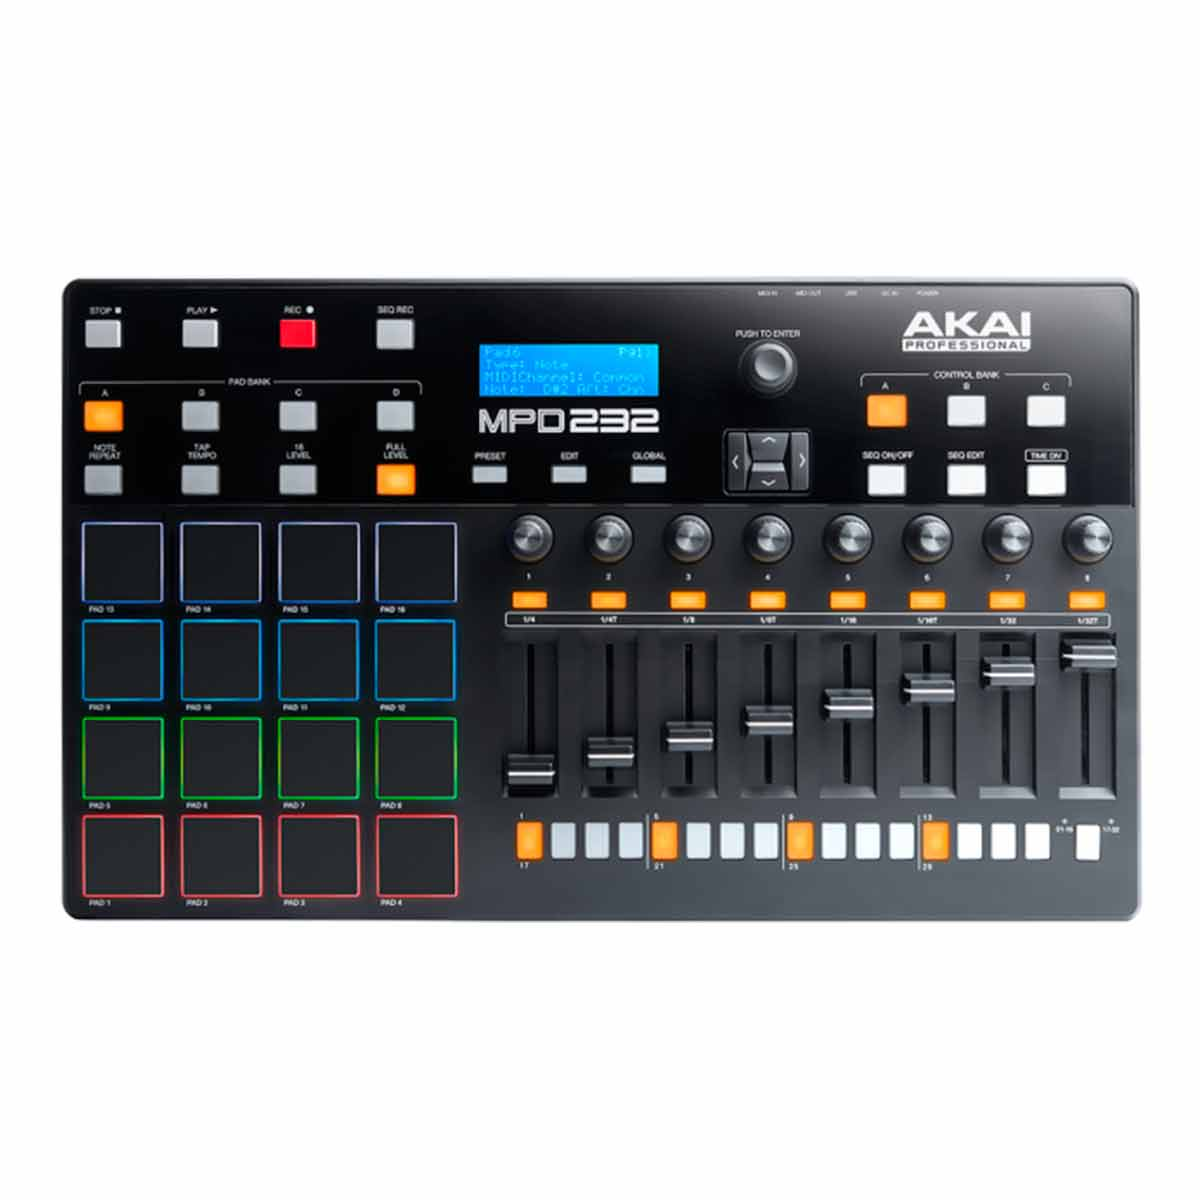 Controladora MIDI / USB MPD 232 - AKAI